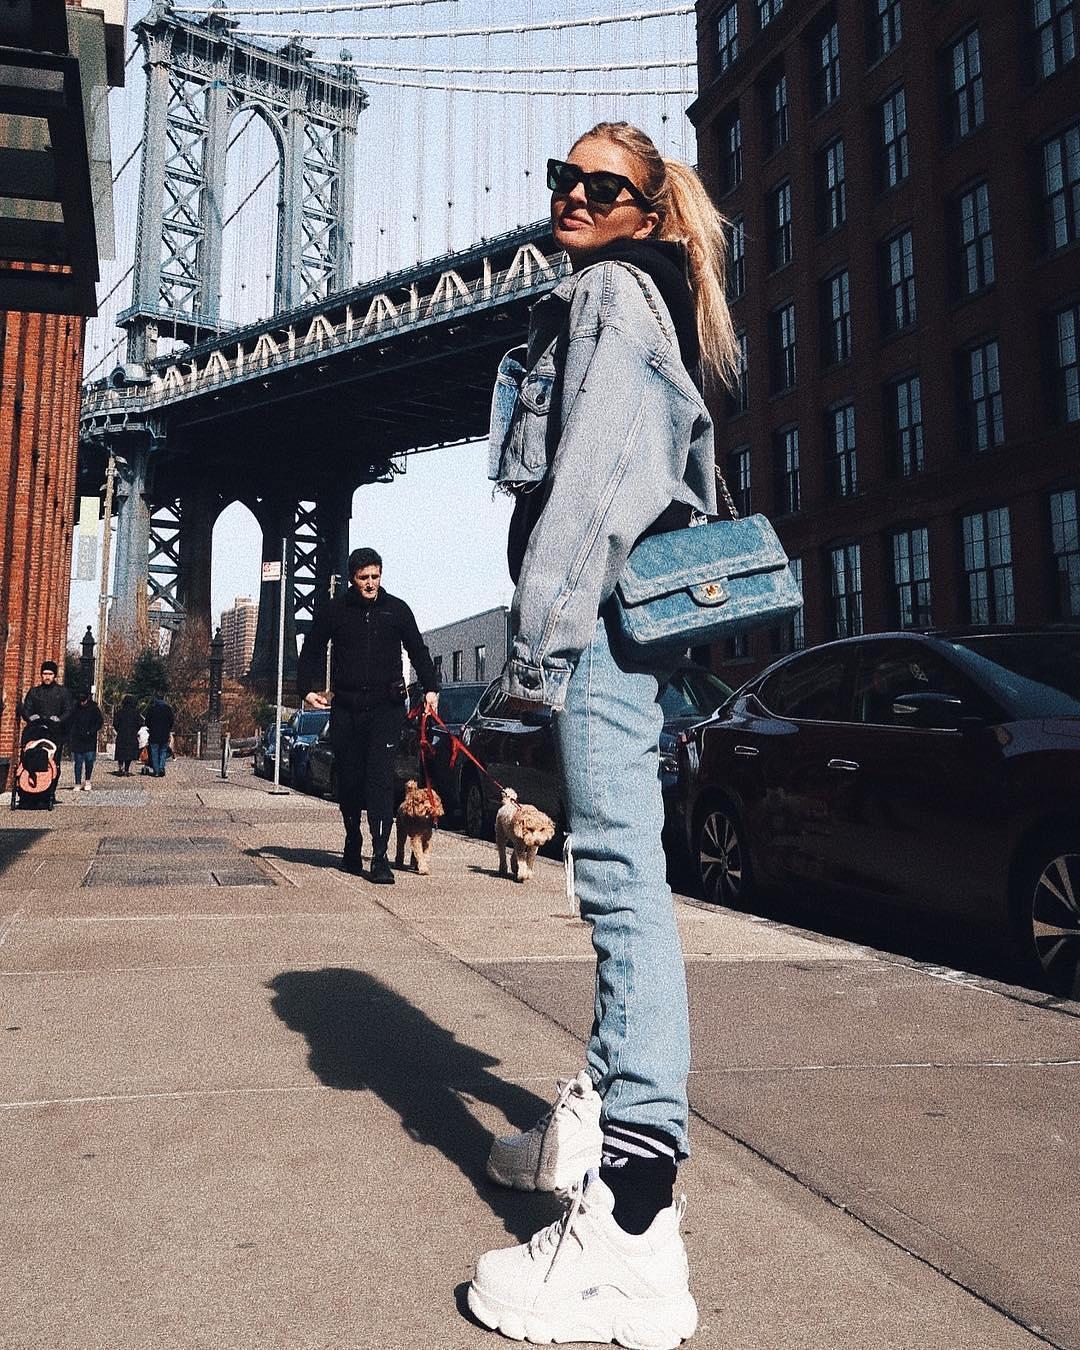 Double denim look: New York spring style 2021